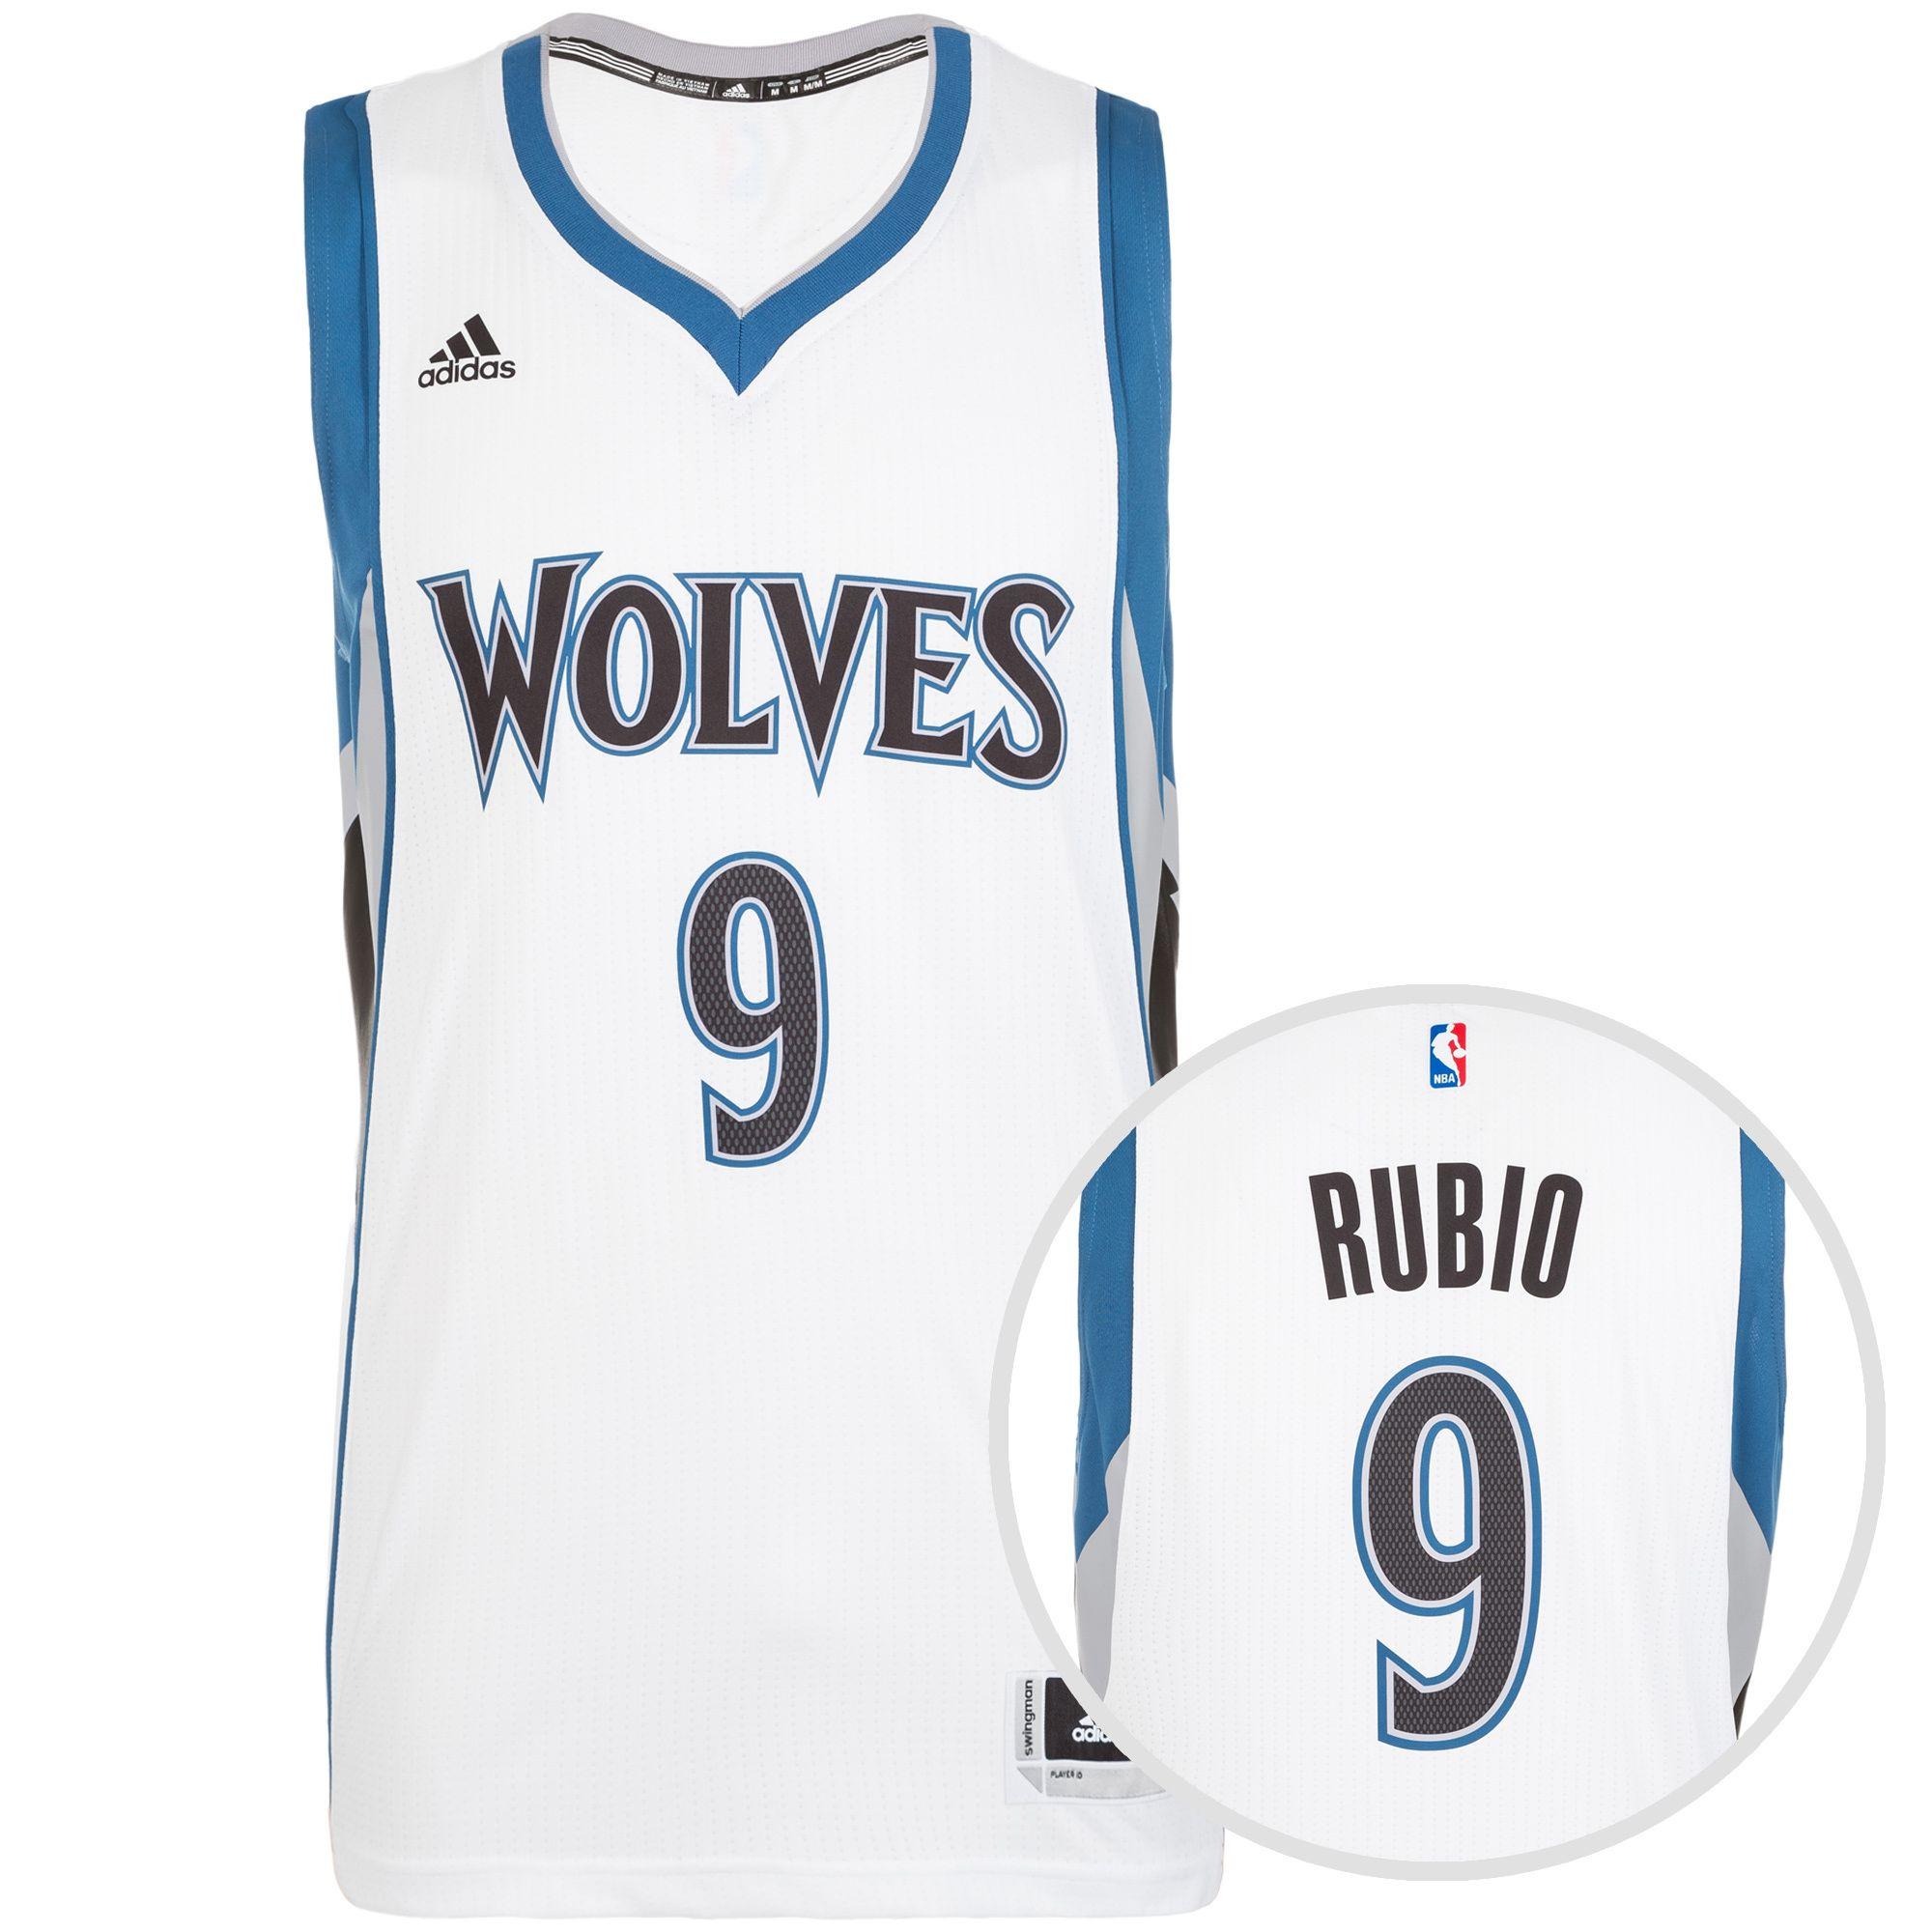 ADIDAS PERFORMANCE adidas Performance Minnesota Timberwolves Rubio Swingman Basketballtrikot Herren